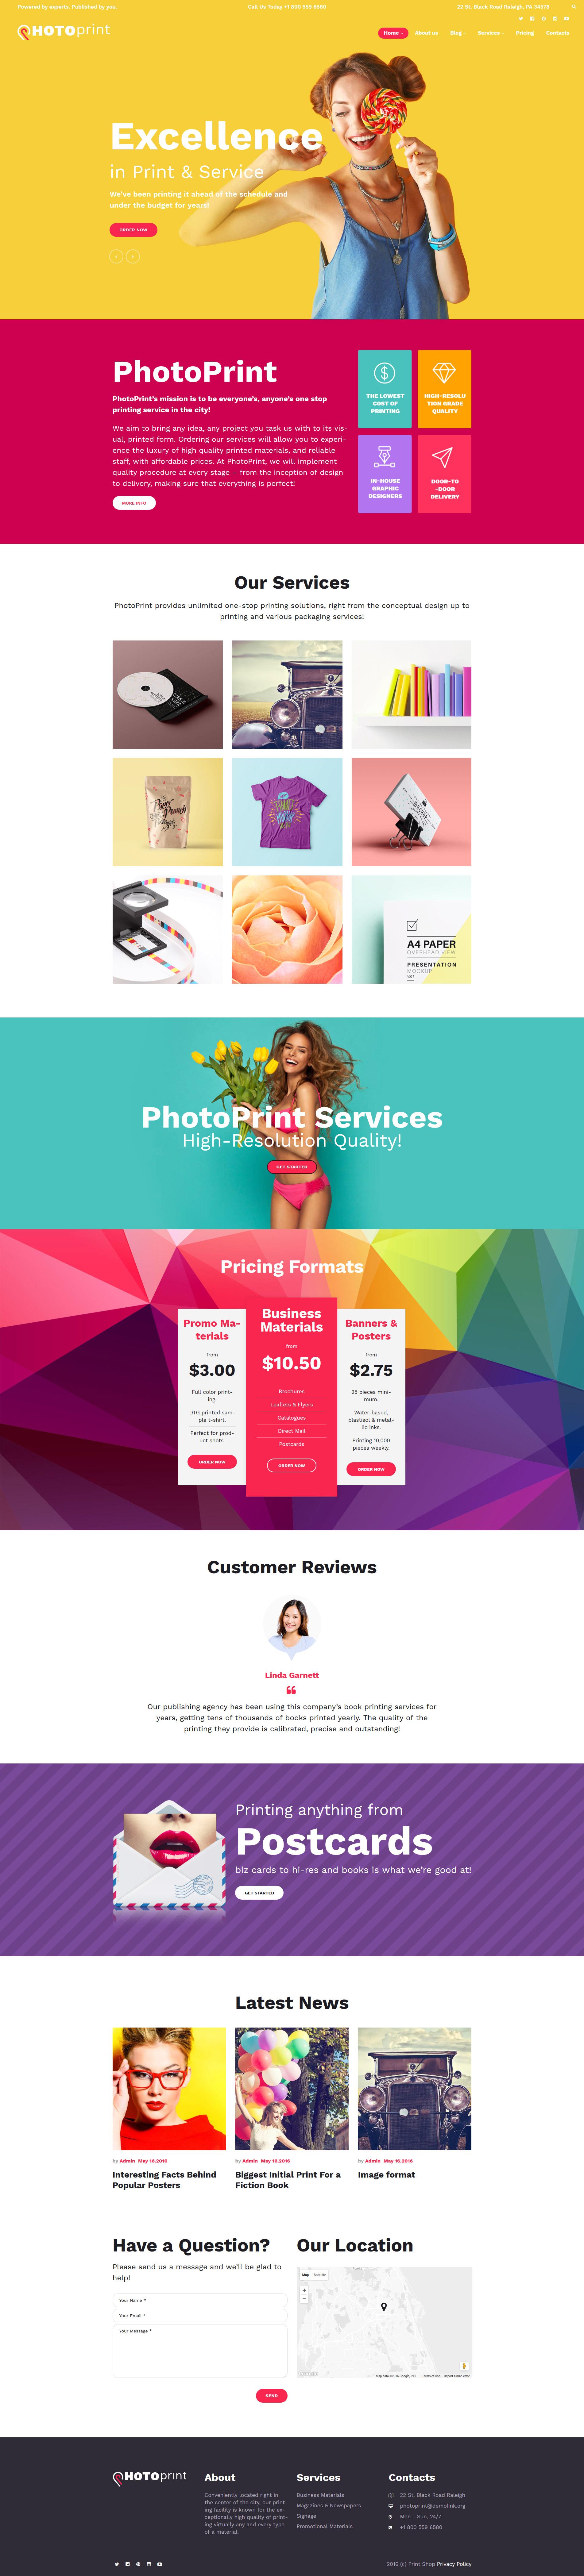 """PhotoPrint - Print Shop Responsive"" 响应式WordPress模板 #60122"